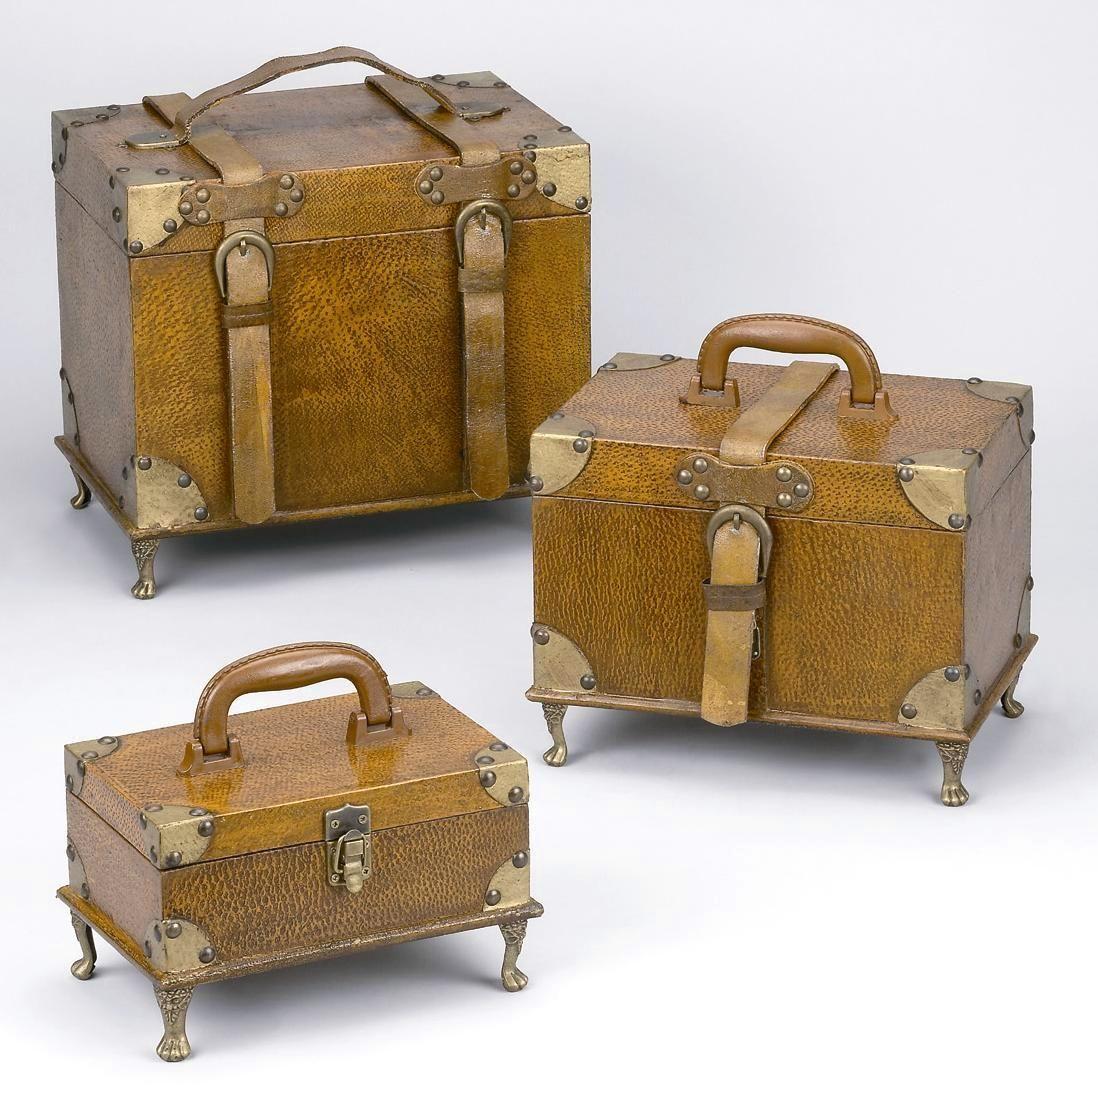 Decorative Luggage Box Vintage Suitcases & Trunks  Vintage Style Suitcase Trunk